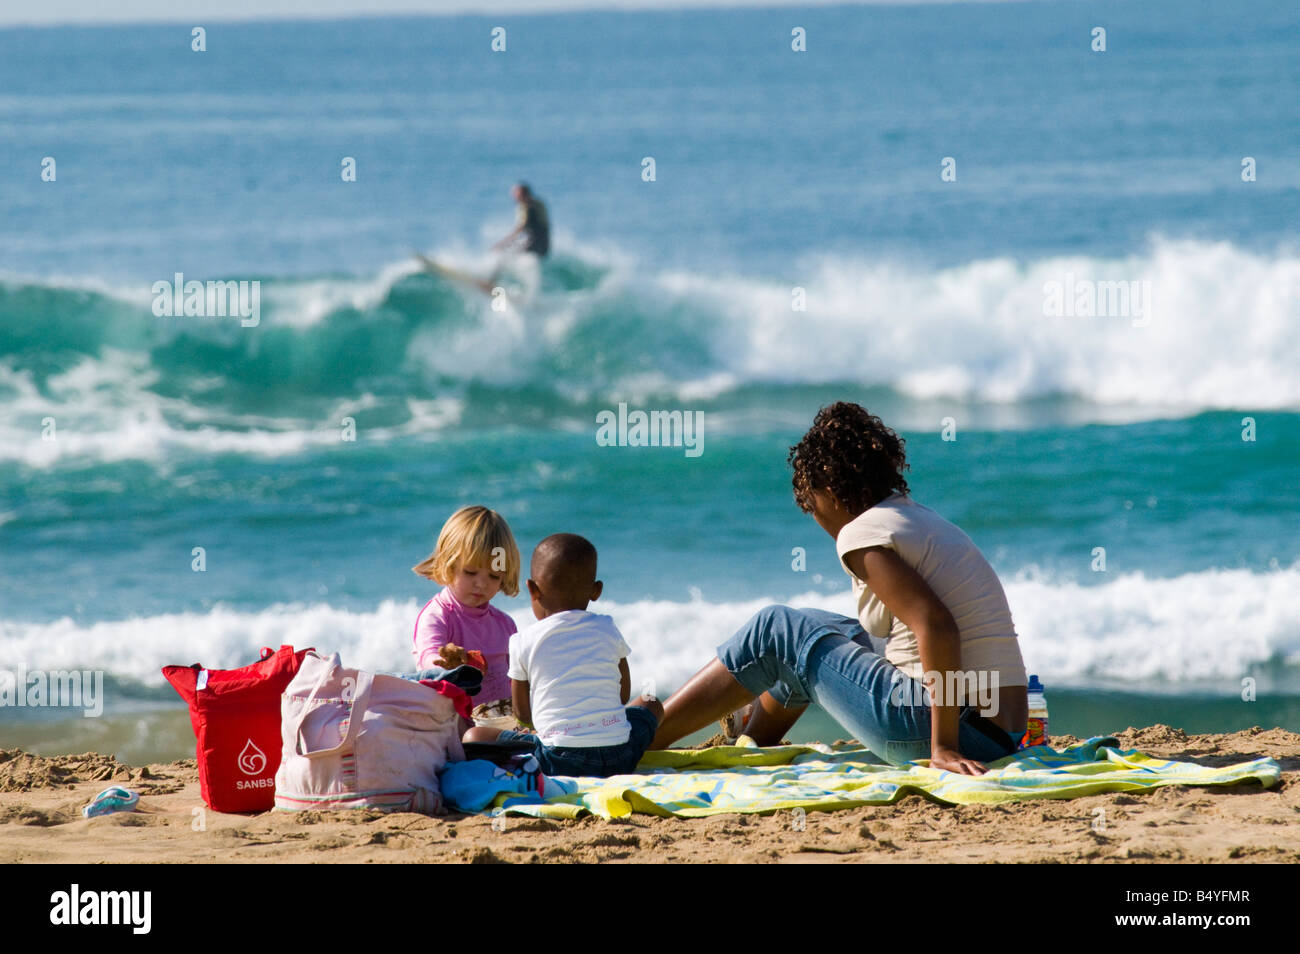 Kids, beach, Durban, Kwazulu-Natal, South Africa - Stock Image